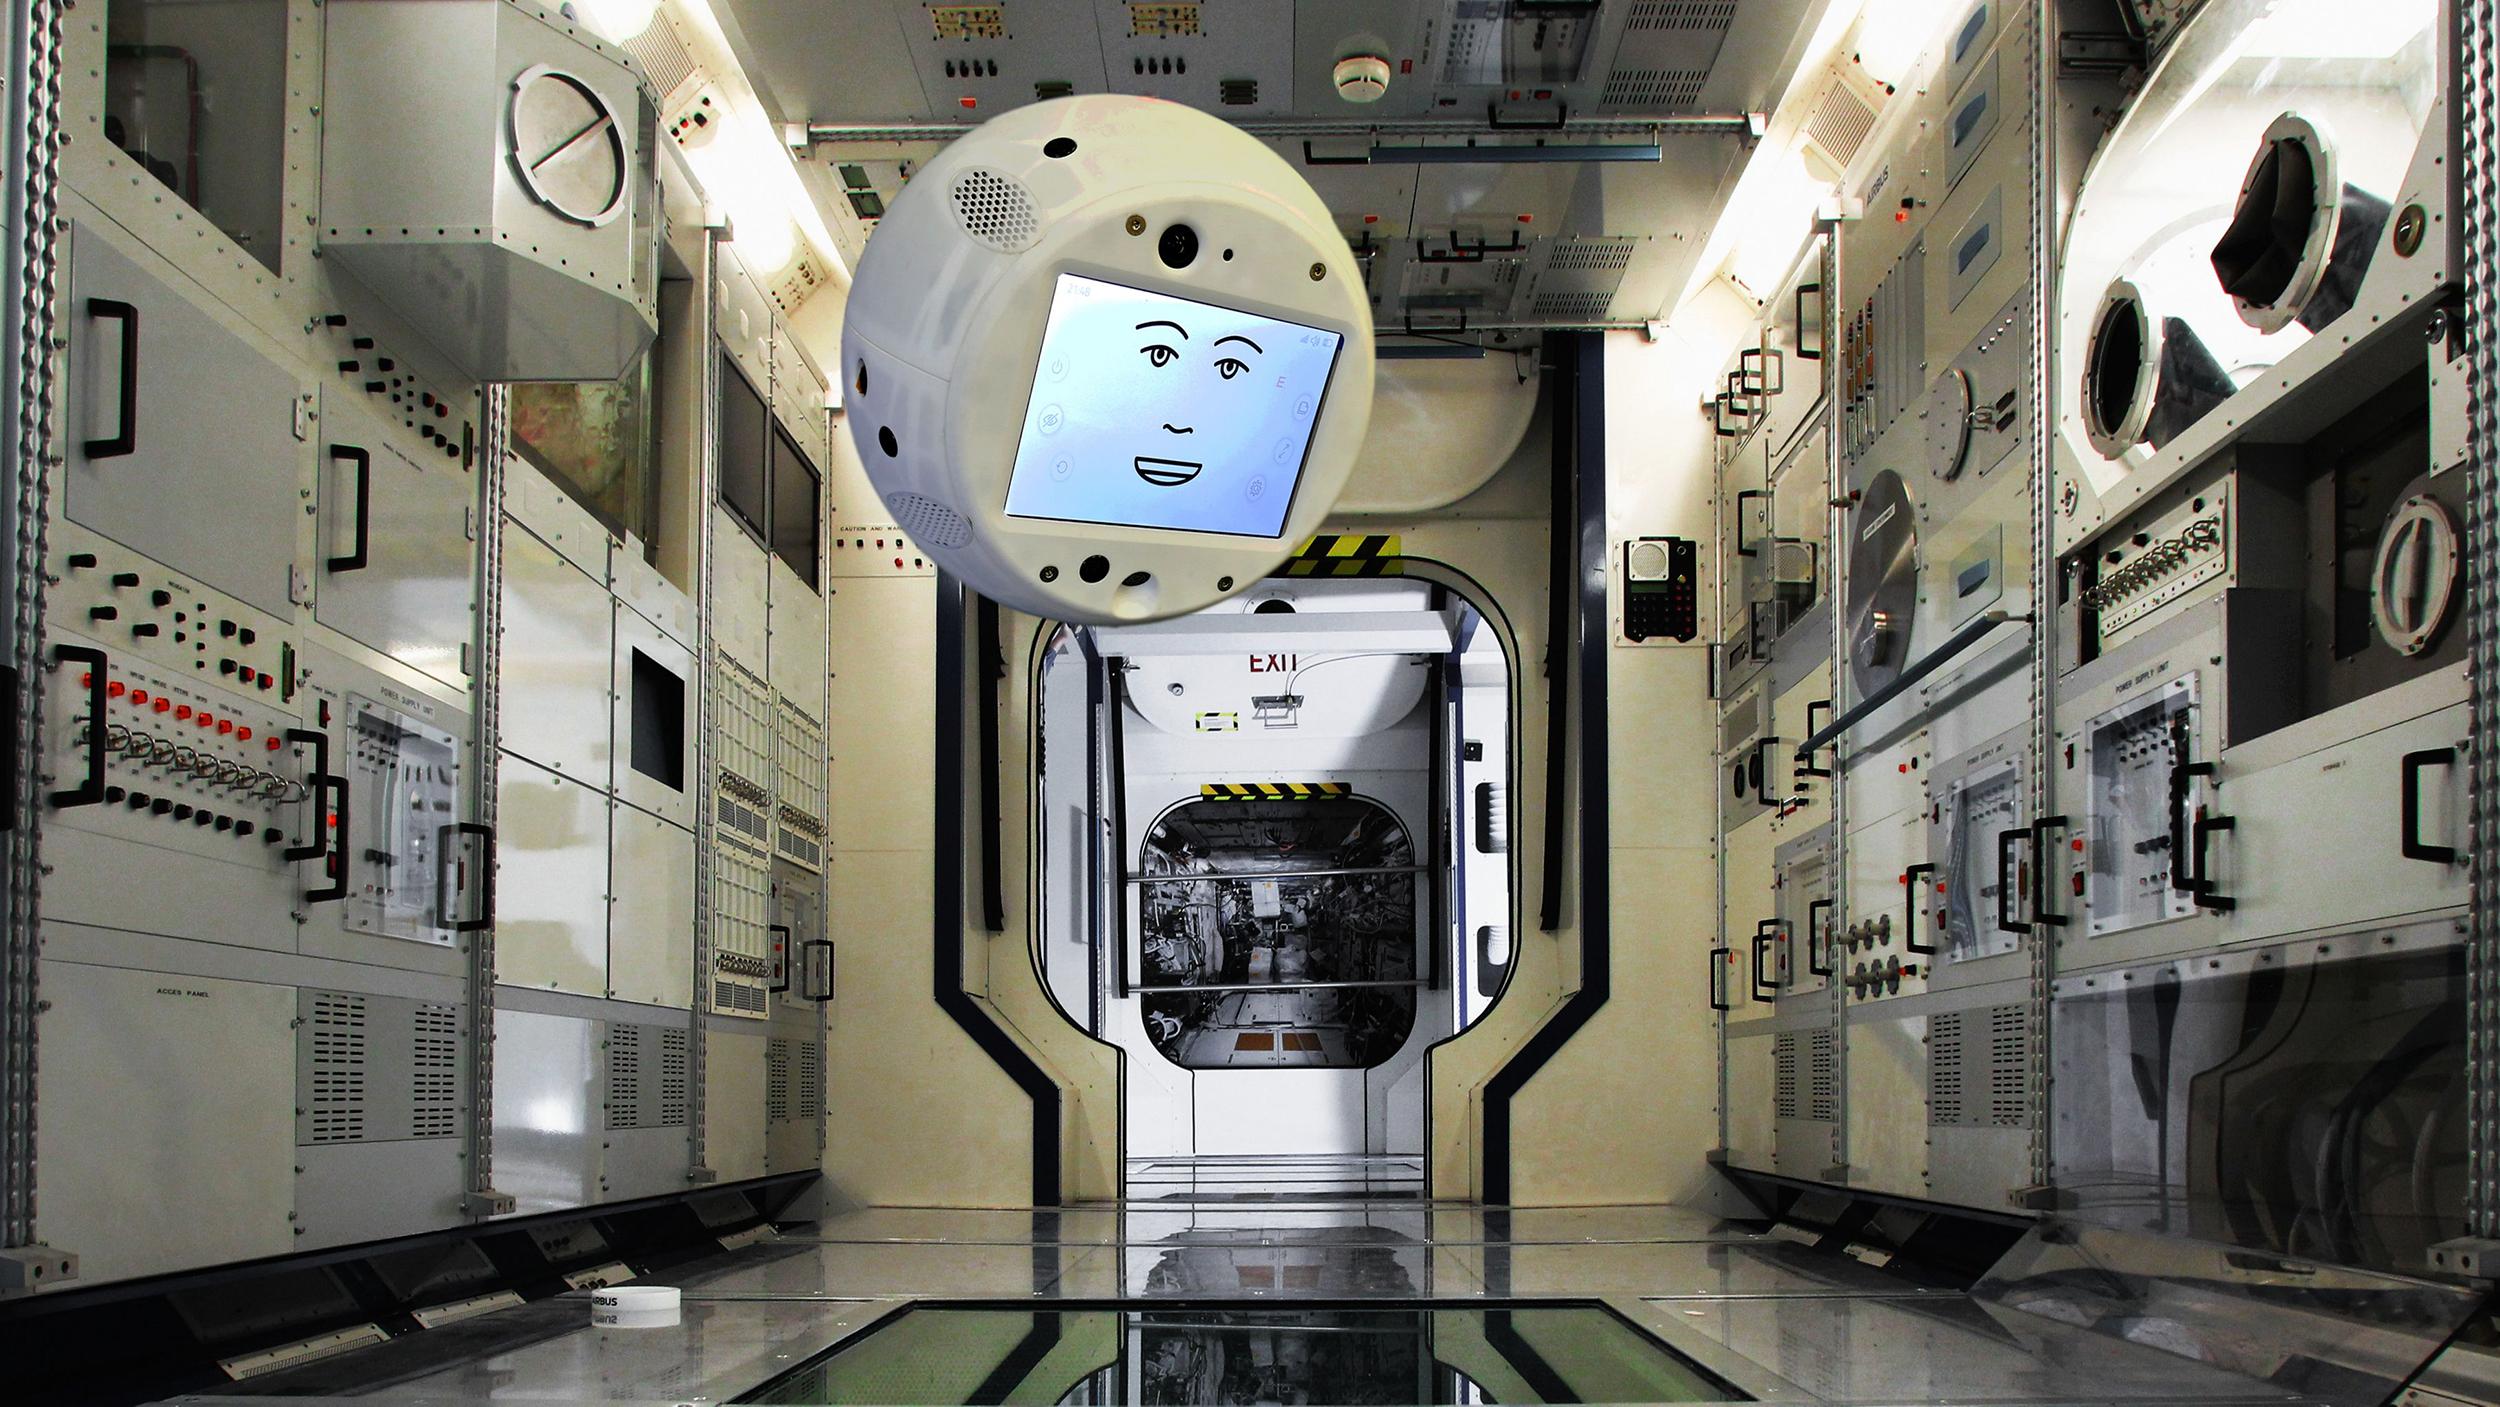 CIMON the European space robot cops an attitude in first test run